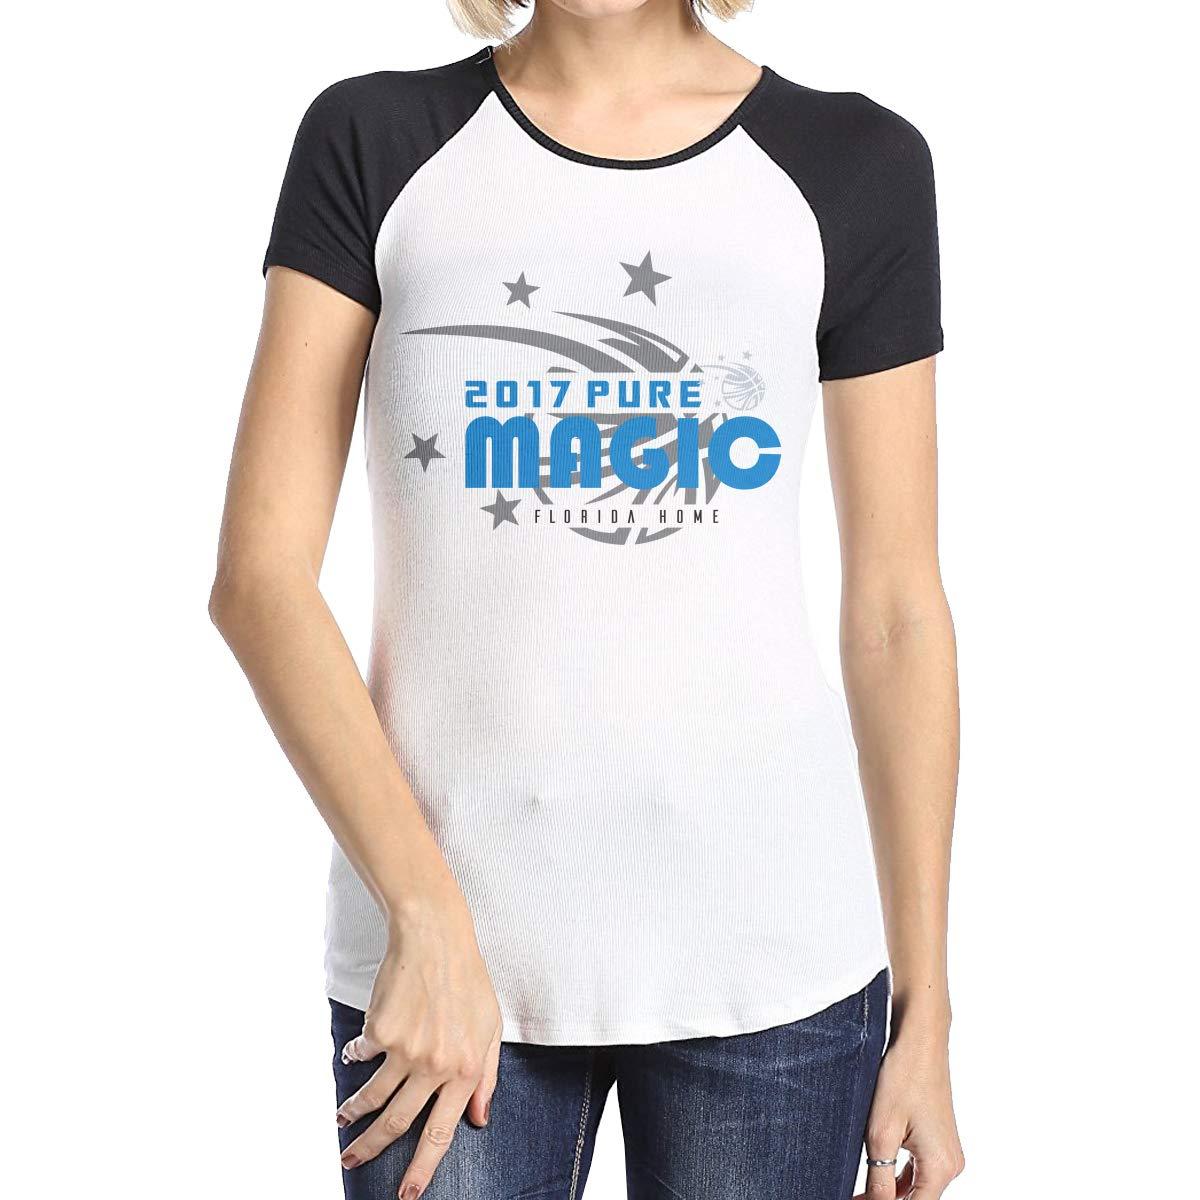 Girls Raglan/Sleeves Jersey Tee Shirt Black MiiyarHome Womens Short Sleeve Baseball T-Shirts Magic Tickets for Sale